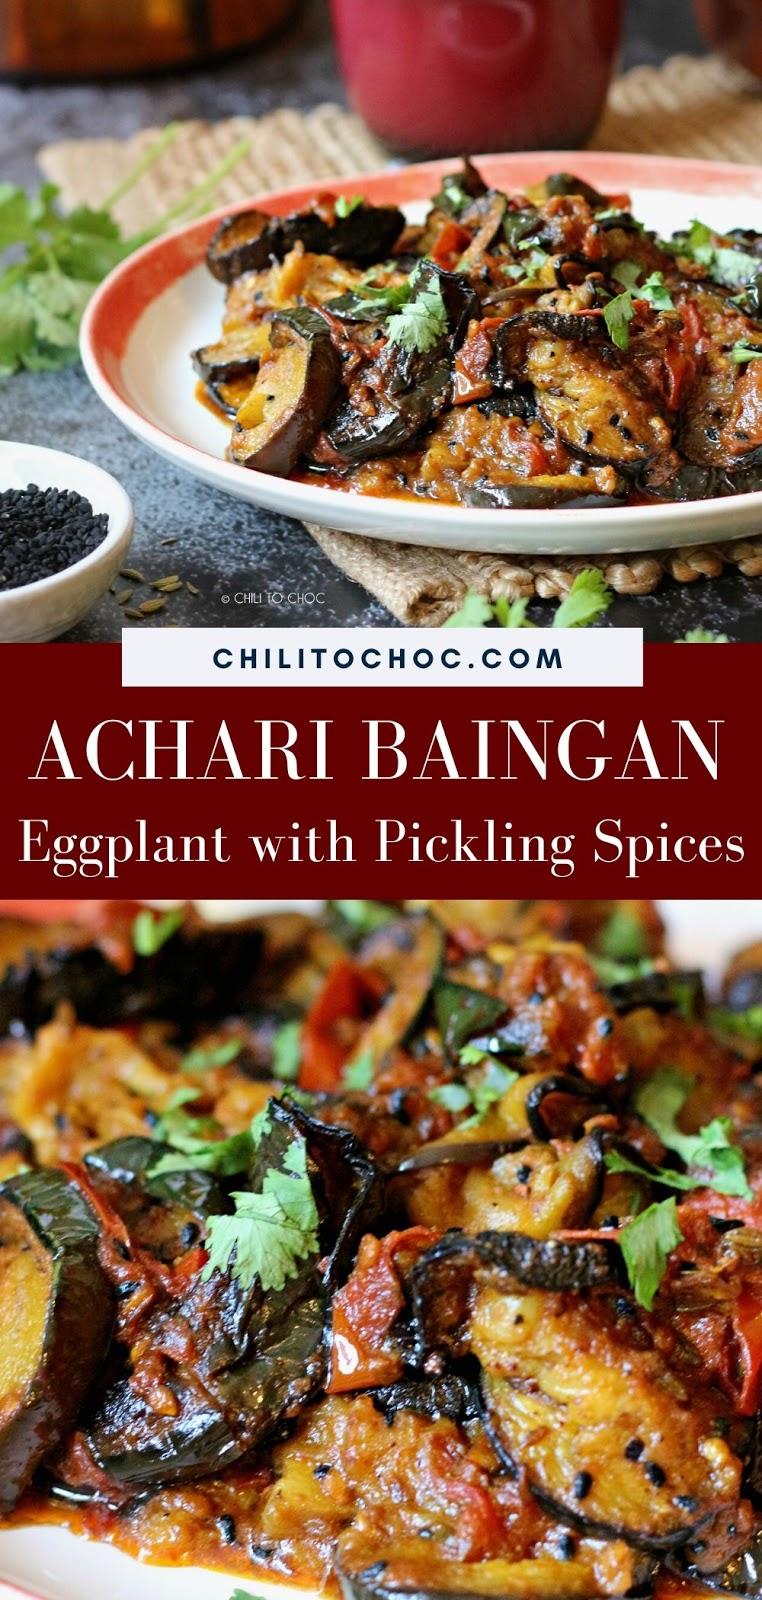 Achari Baingan (Eggplant with Pickling Spices)